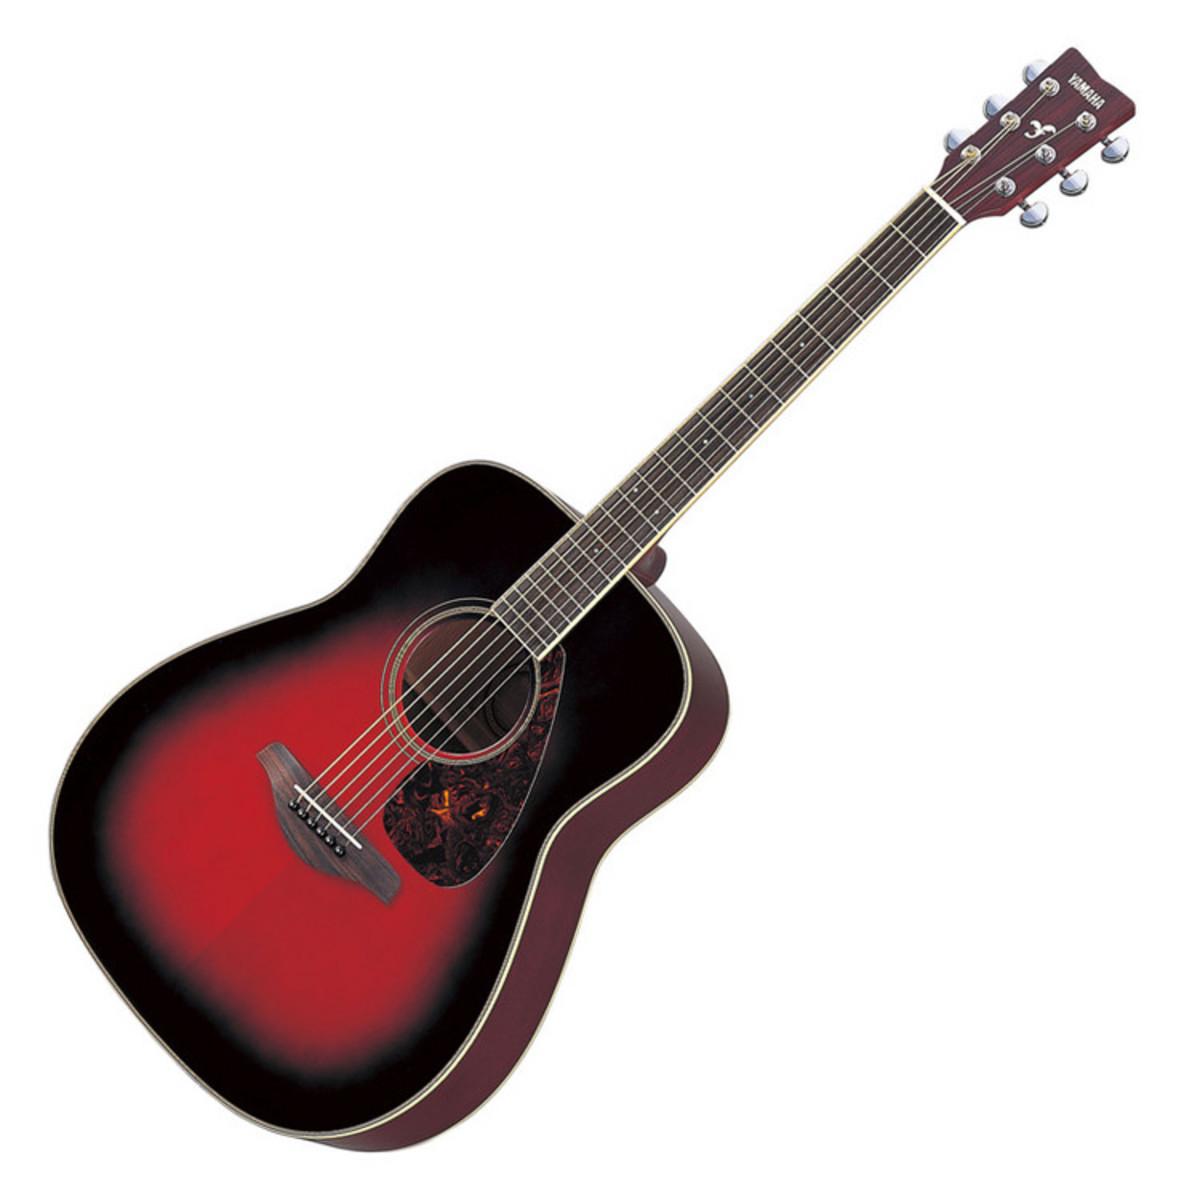 yamaha fg720s guitare acoustique rouge cr puscule. Black Bedroom Furniture Sets. Home Design Ideas